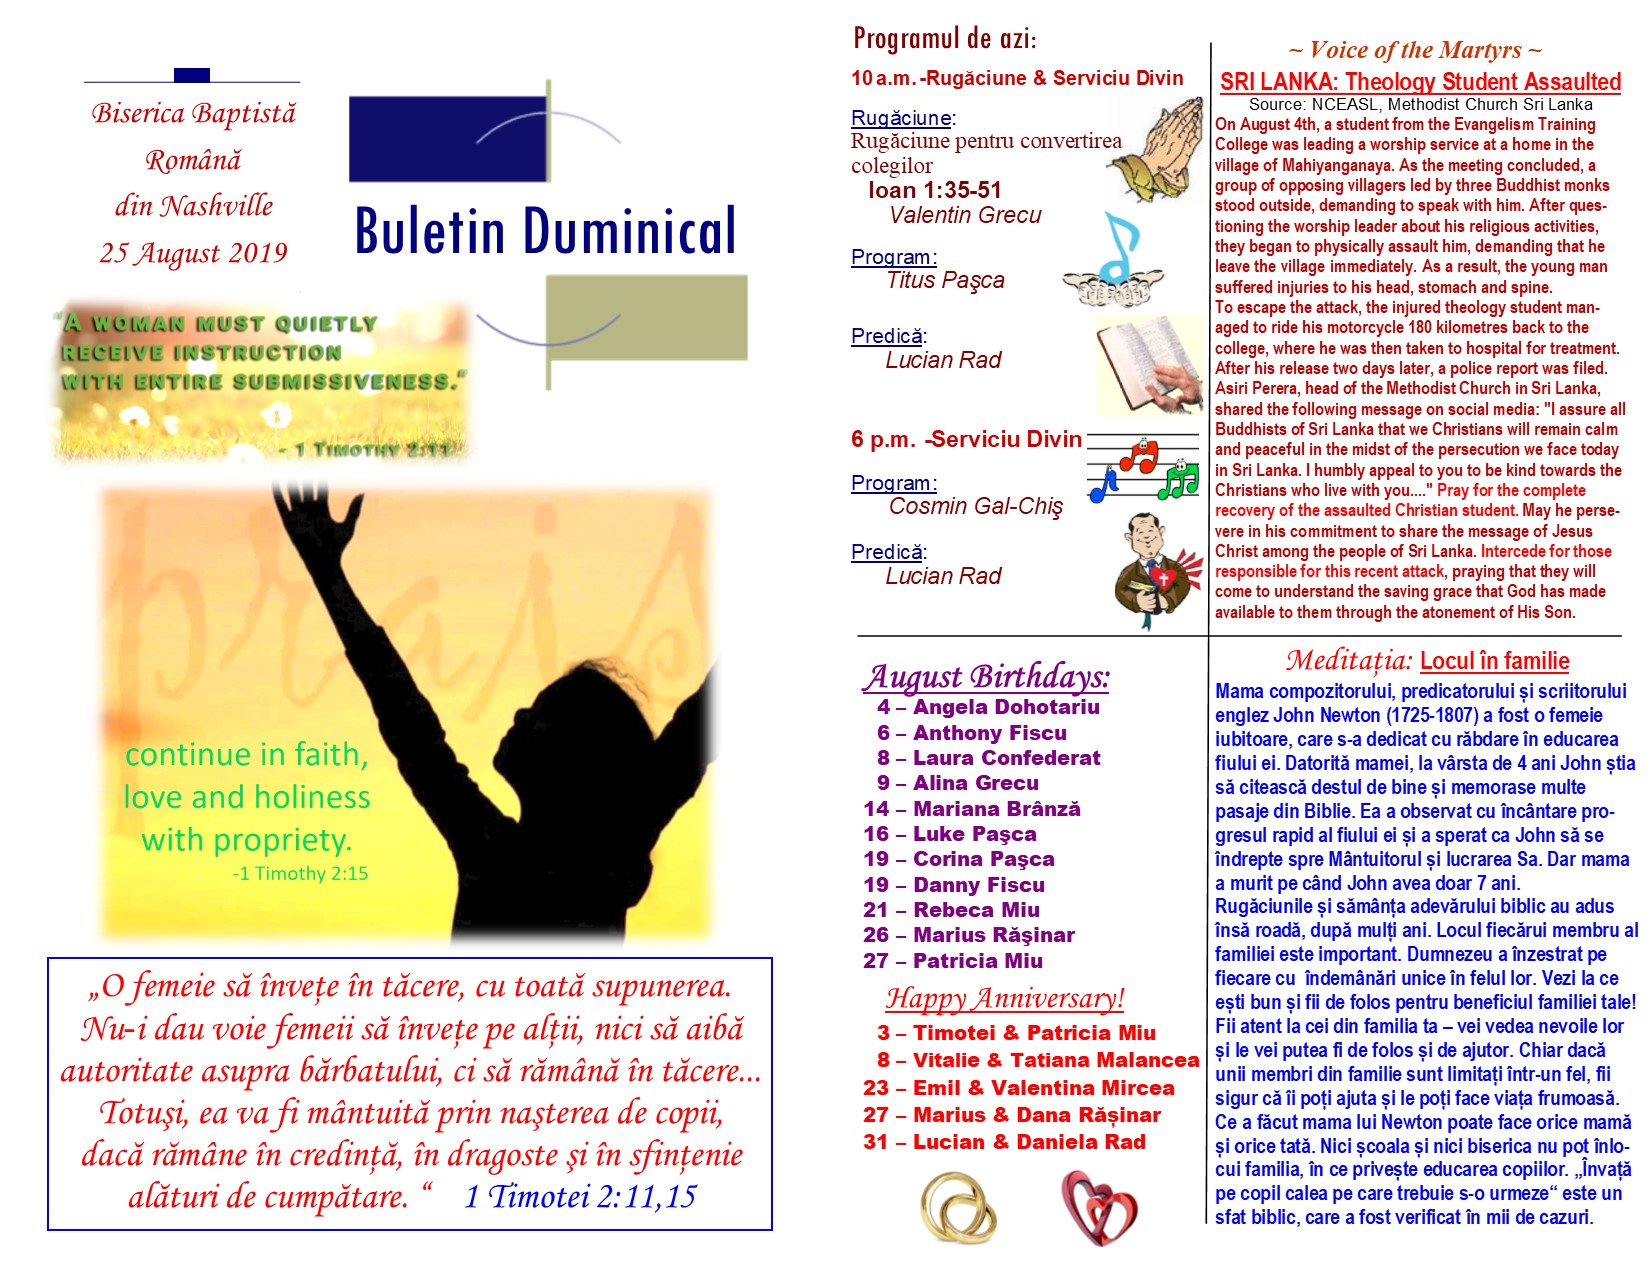 Buletin 08-25-19 page 1 & 2